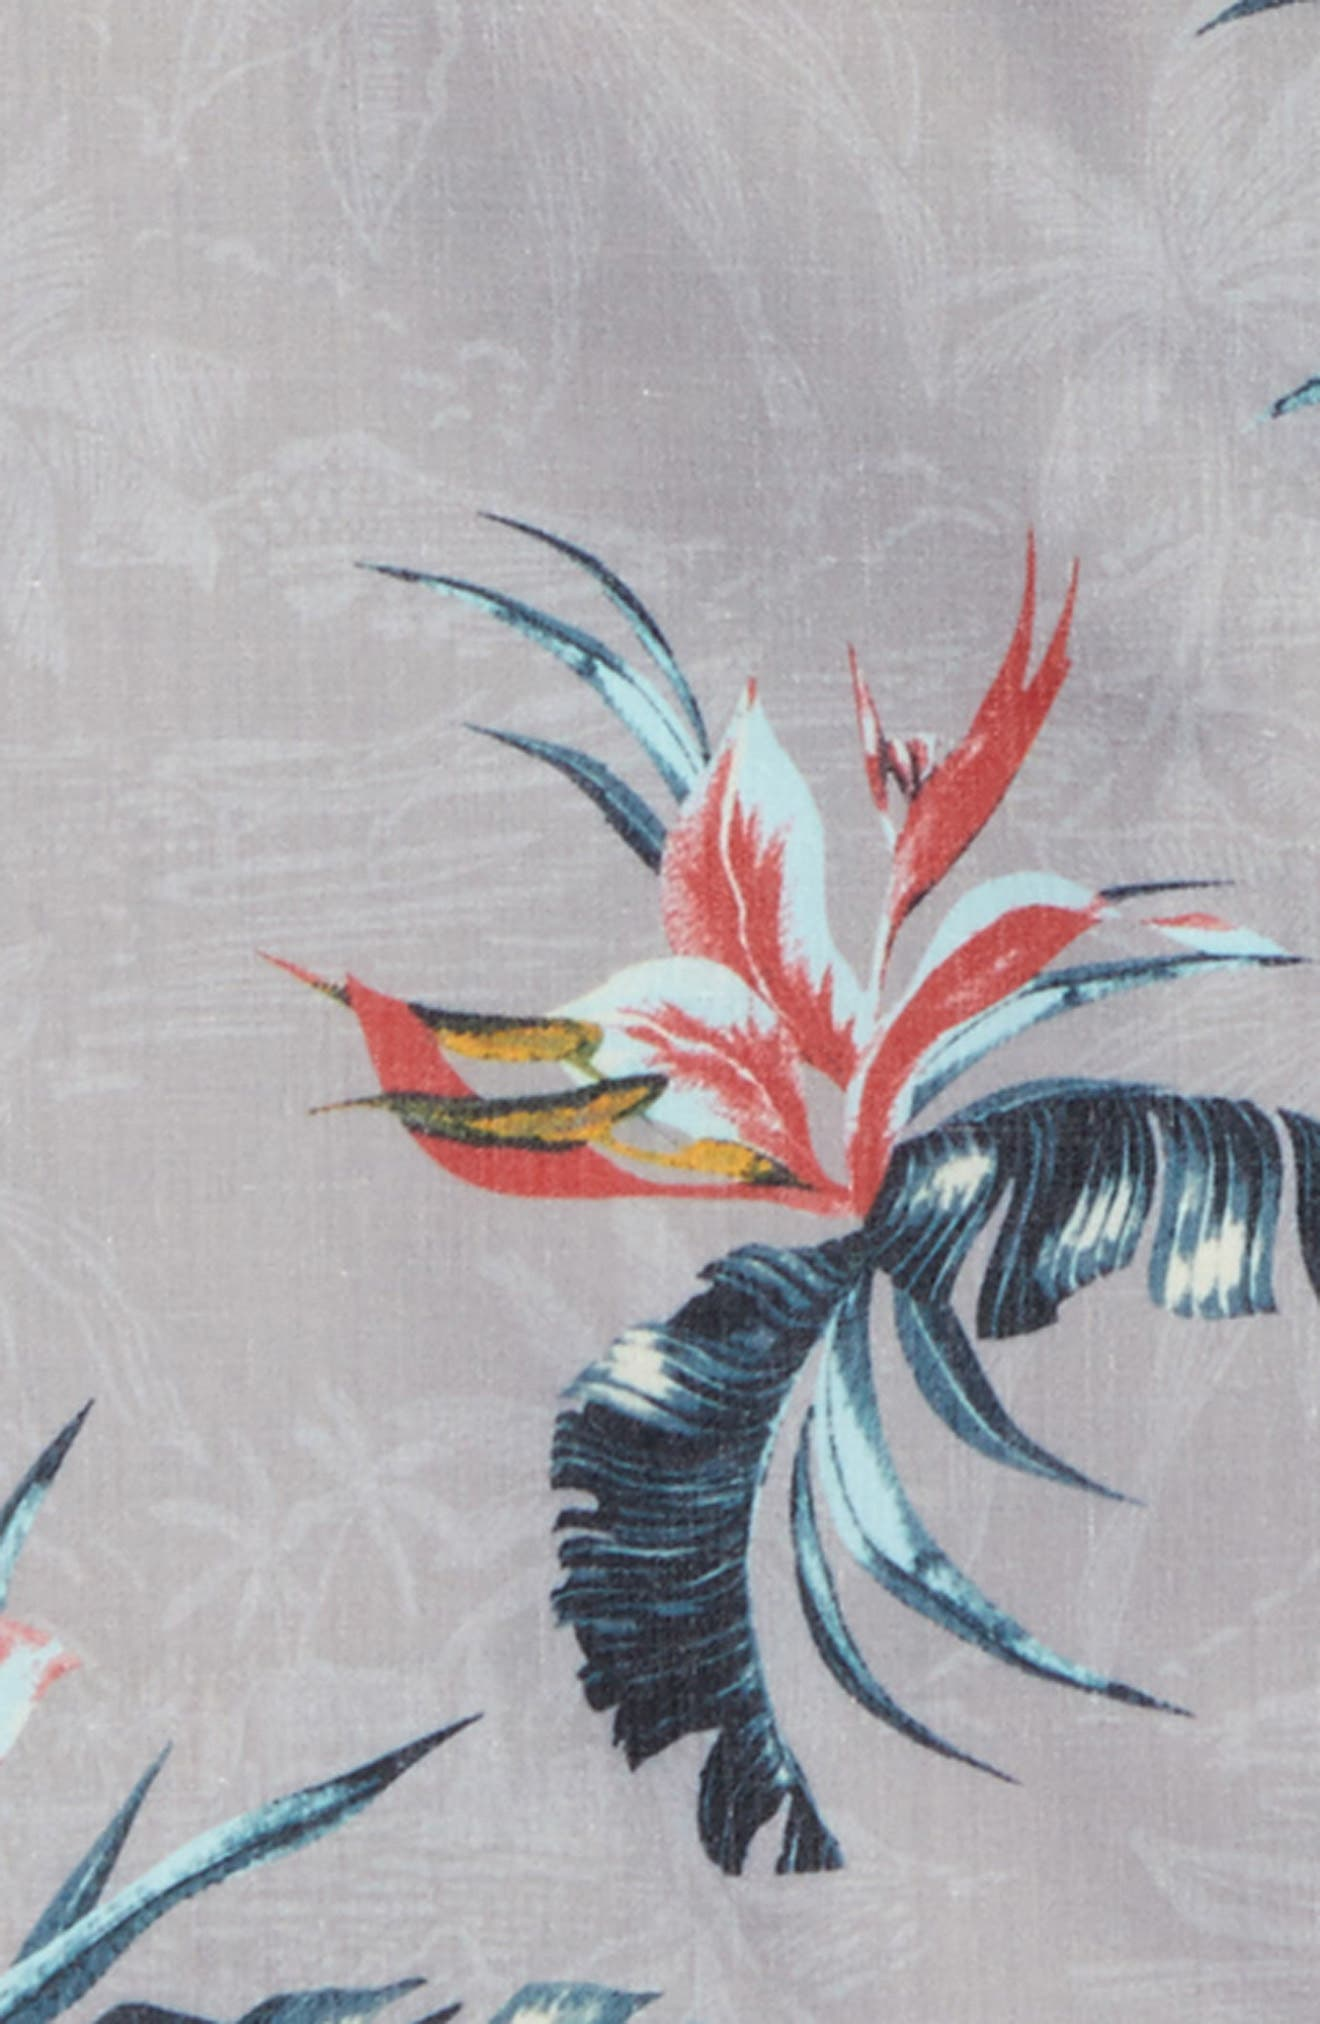 Islander Floral Print Woven Shirt,                             Alternate thumbnail 3, color,                             Light Grey